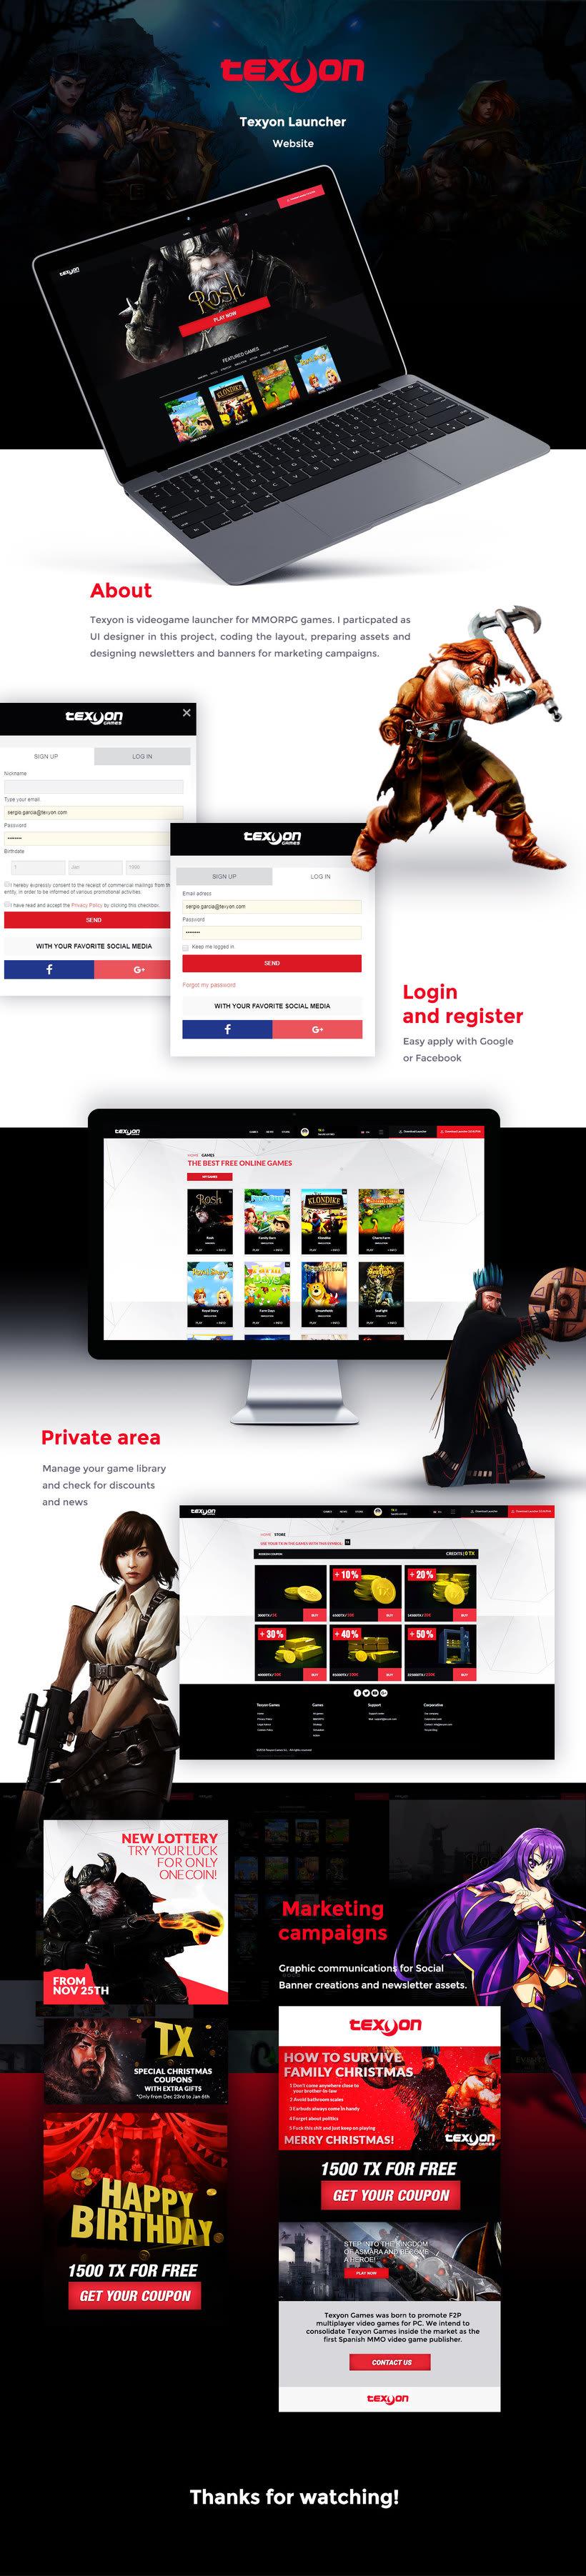 Texyon Games Launcher Website 0